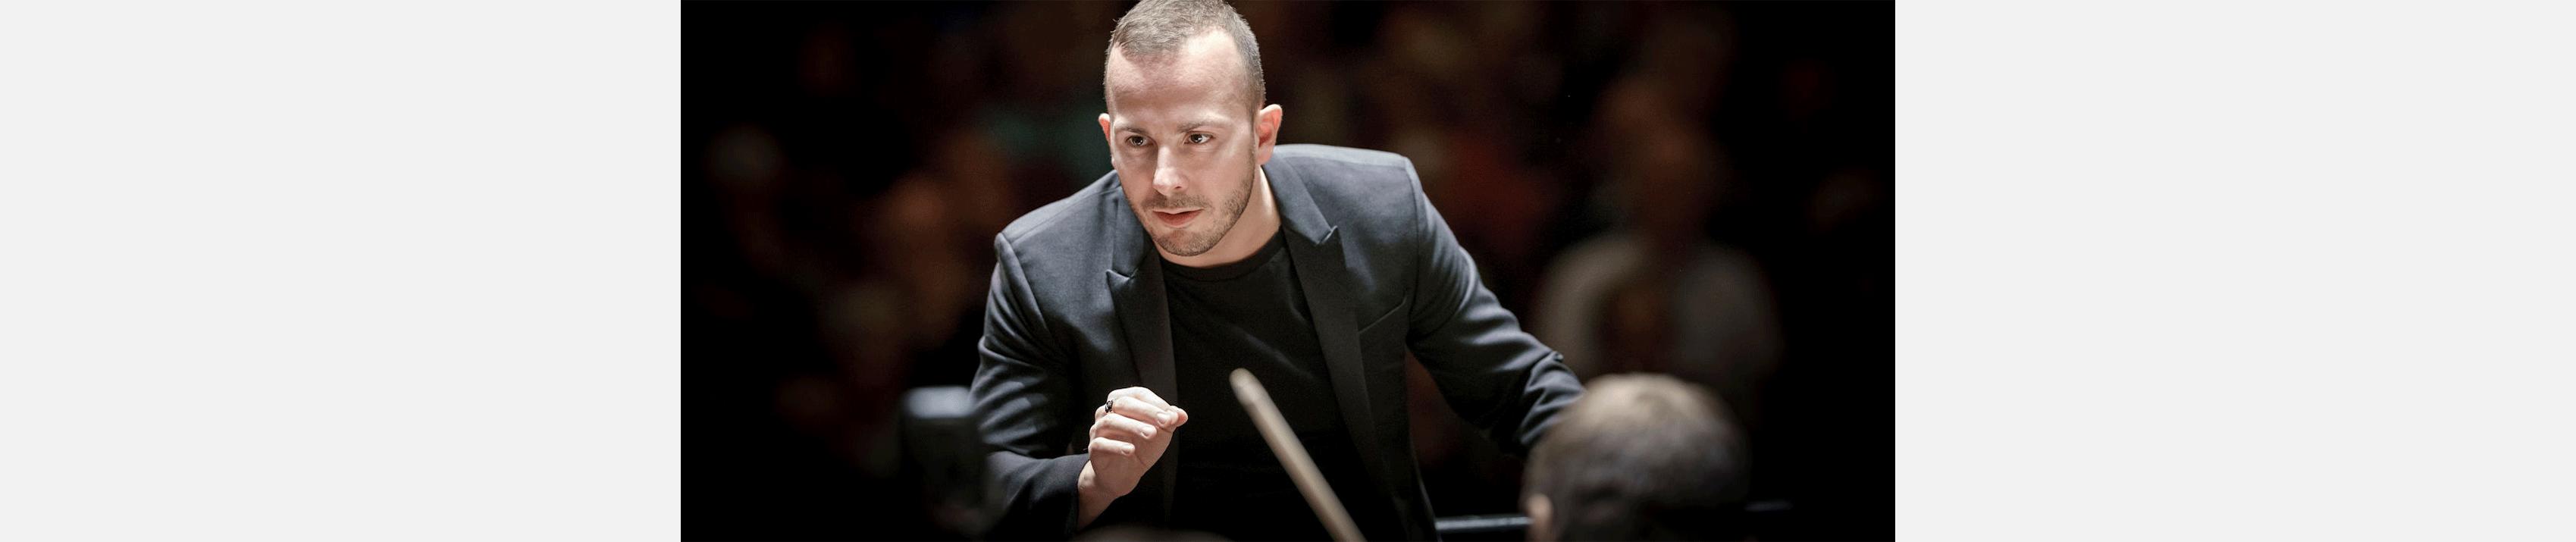 Master Class with Yannick Nézet-Séguin